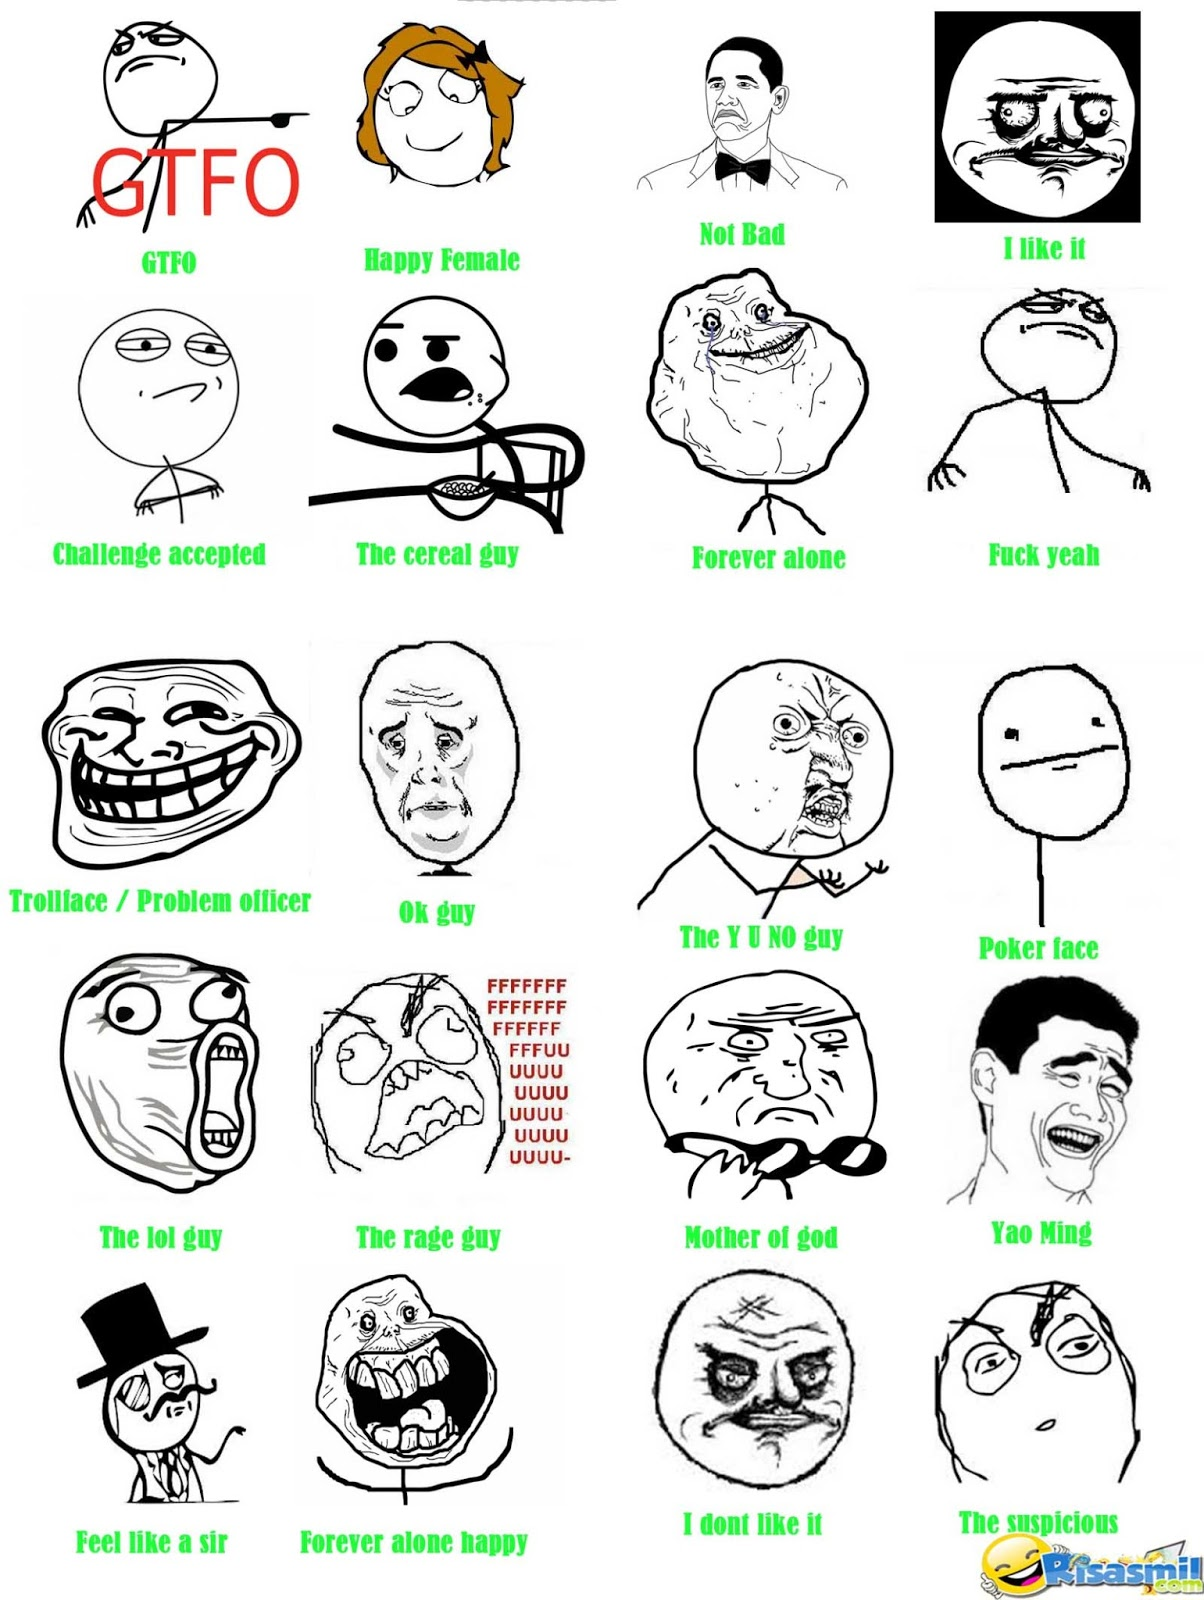 Tags: nada | memes | imagenes | troll